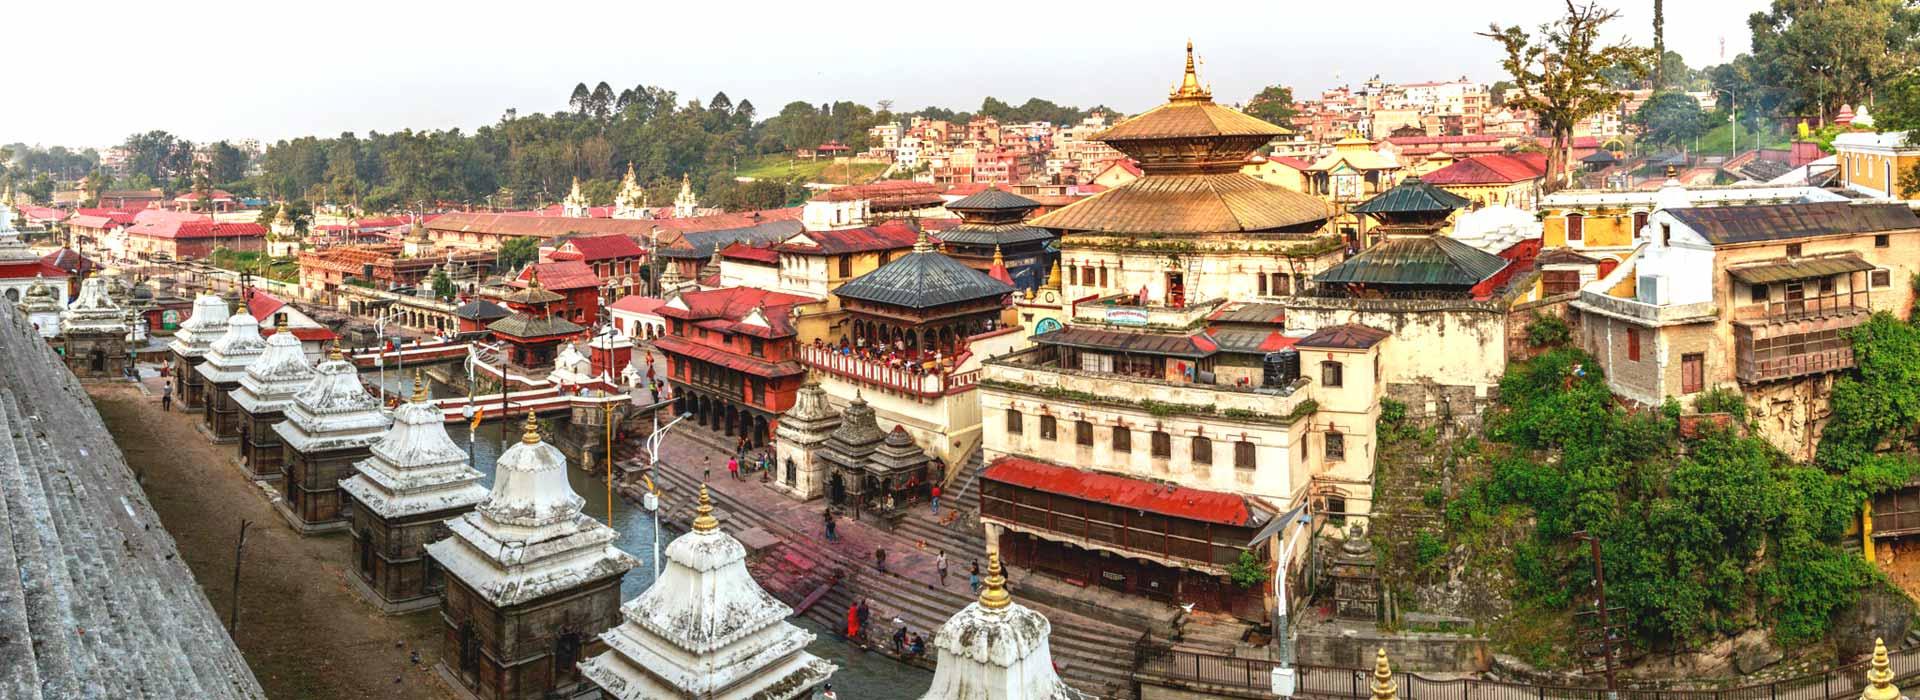 Kathmandu Heritage Tour - Pashupatinath Temple